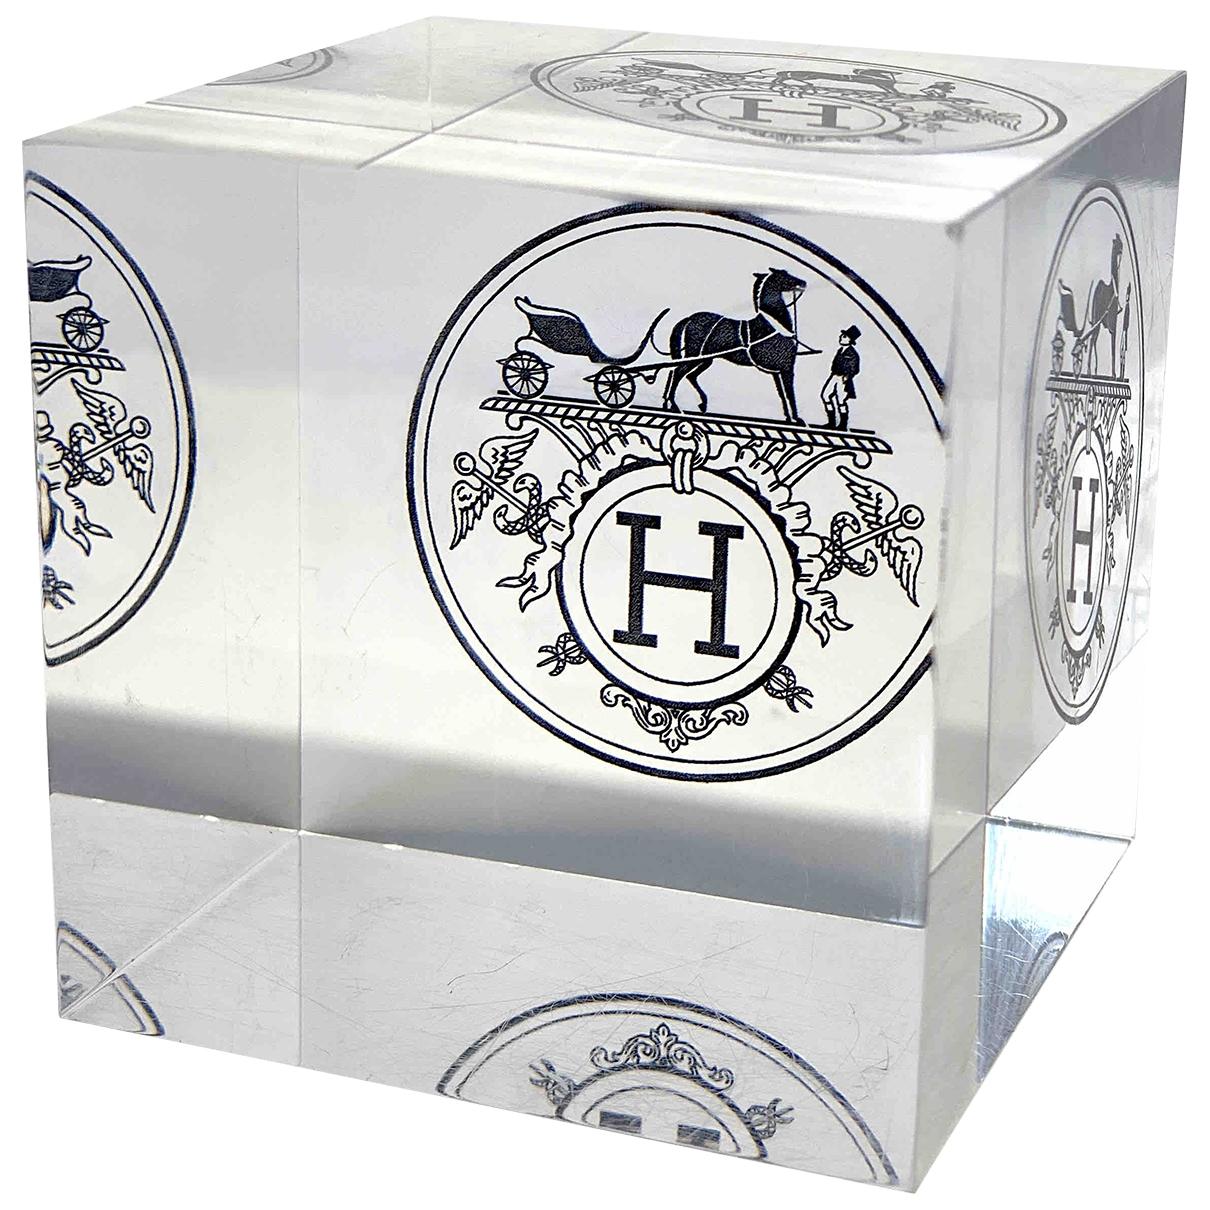 Objeto de decoracion Hermes